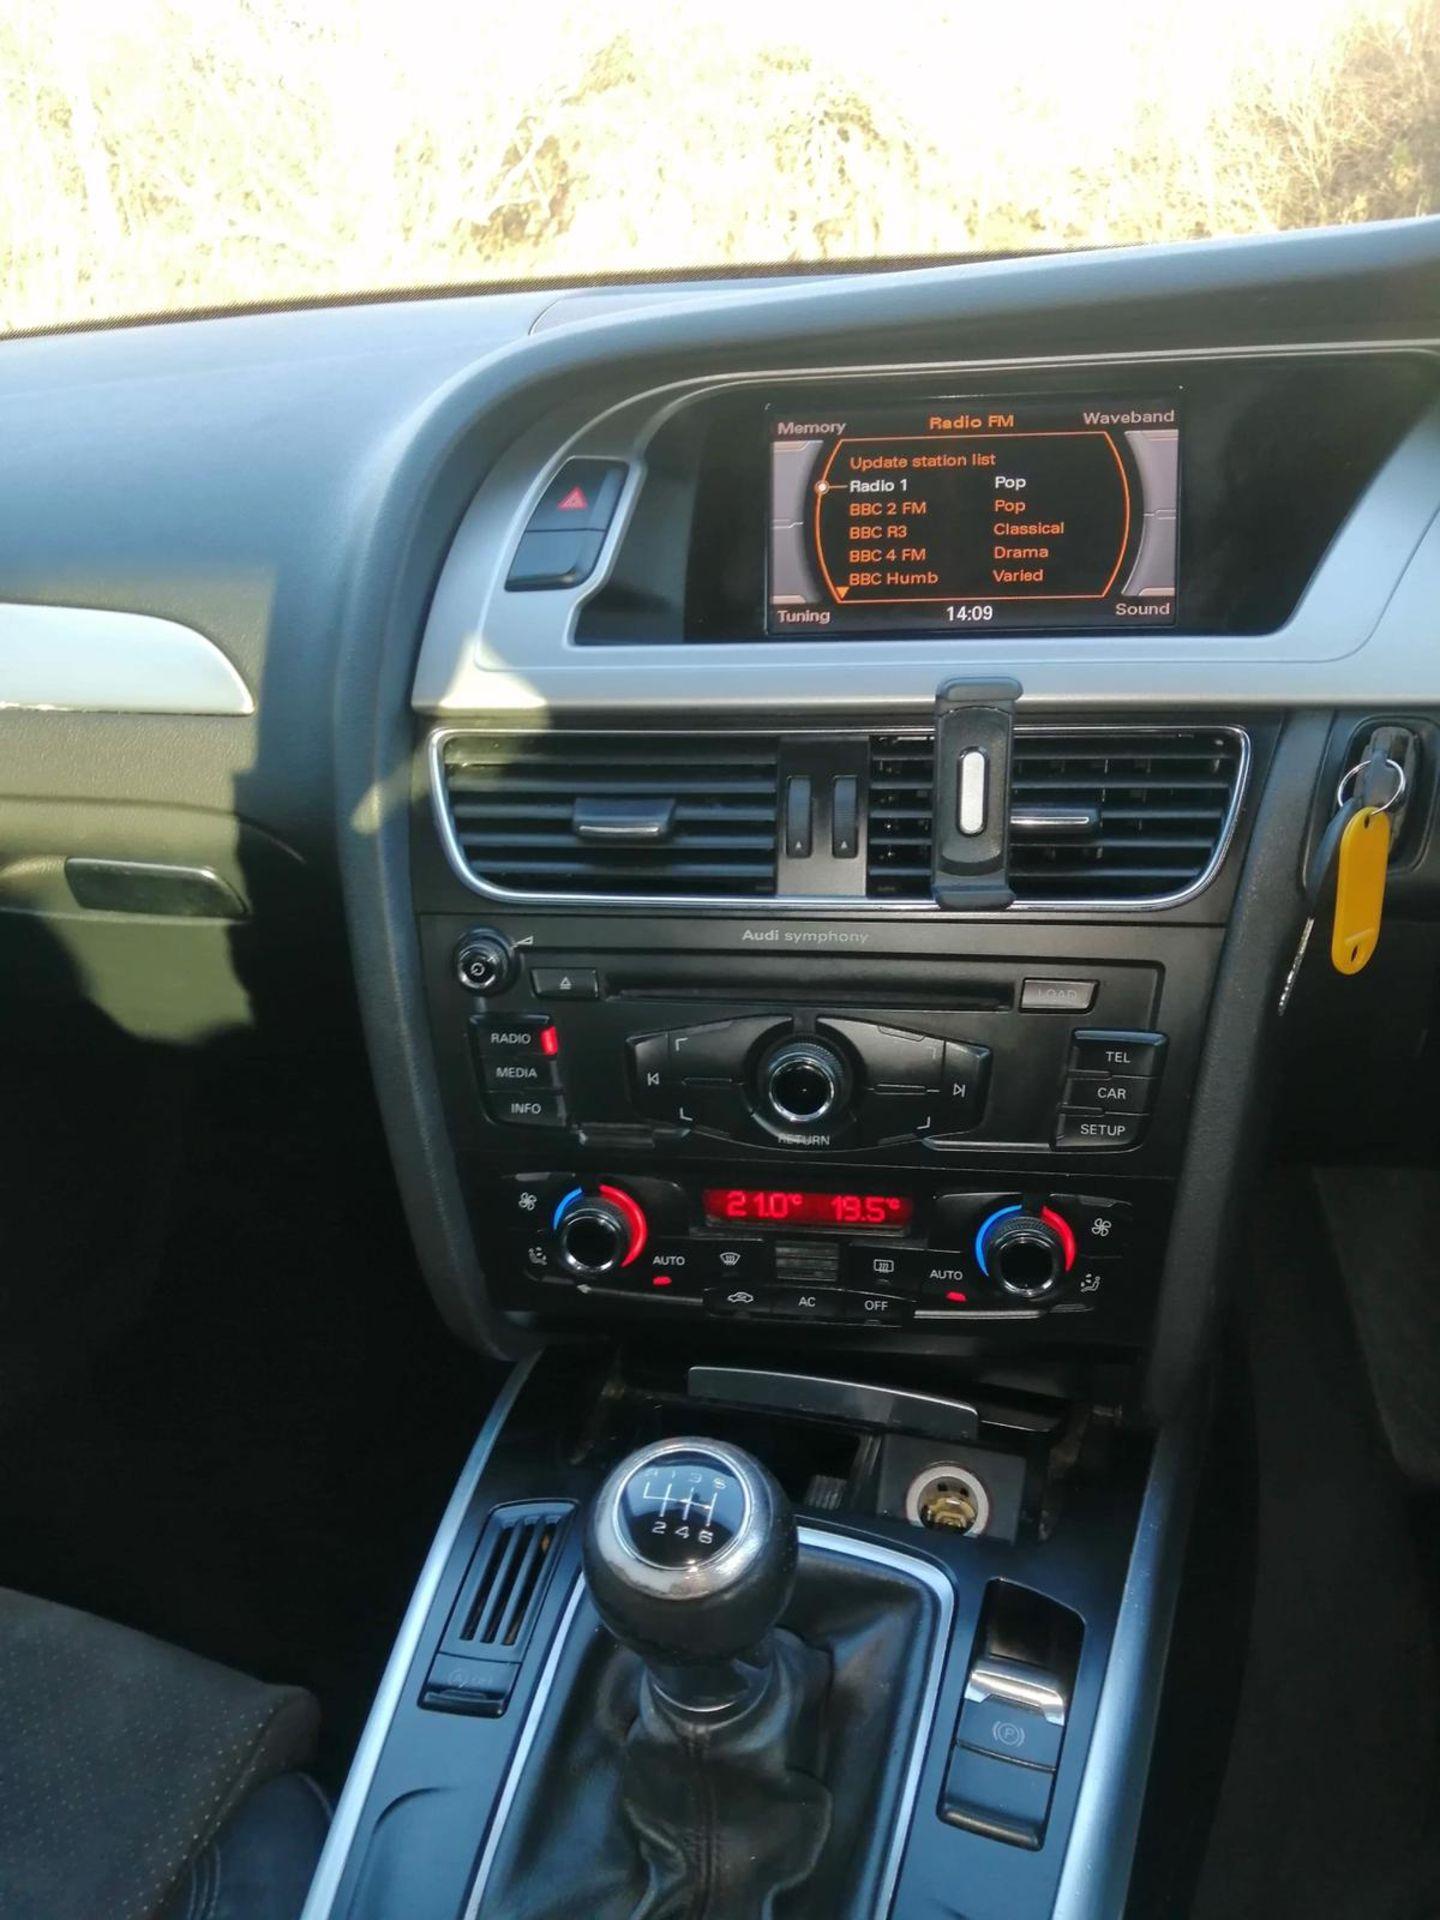 2009/59 REG AUDI A4 S LINE TDI 2.0 DIESEL BLACK 4 DOOR SALOON, SHOWING 2 FORMER KEEPERS *NO VAT* - Image 6 of 13